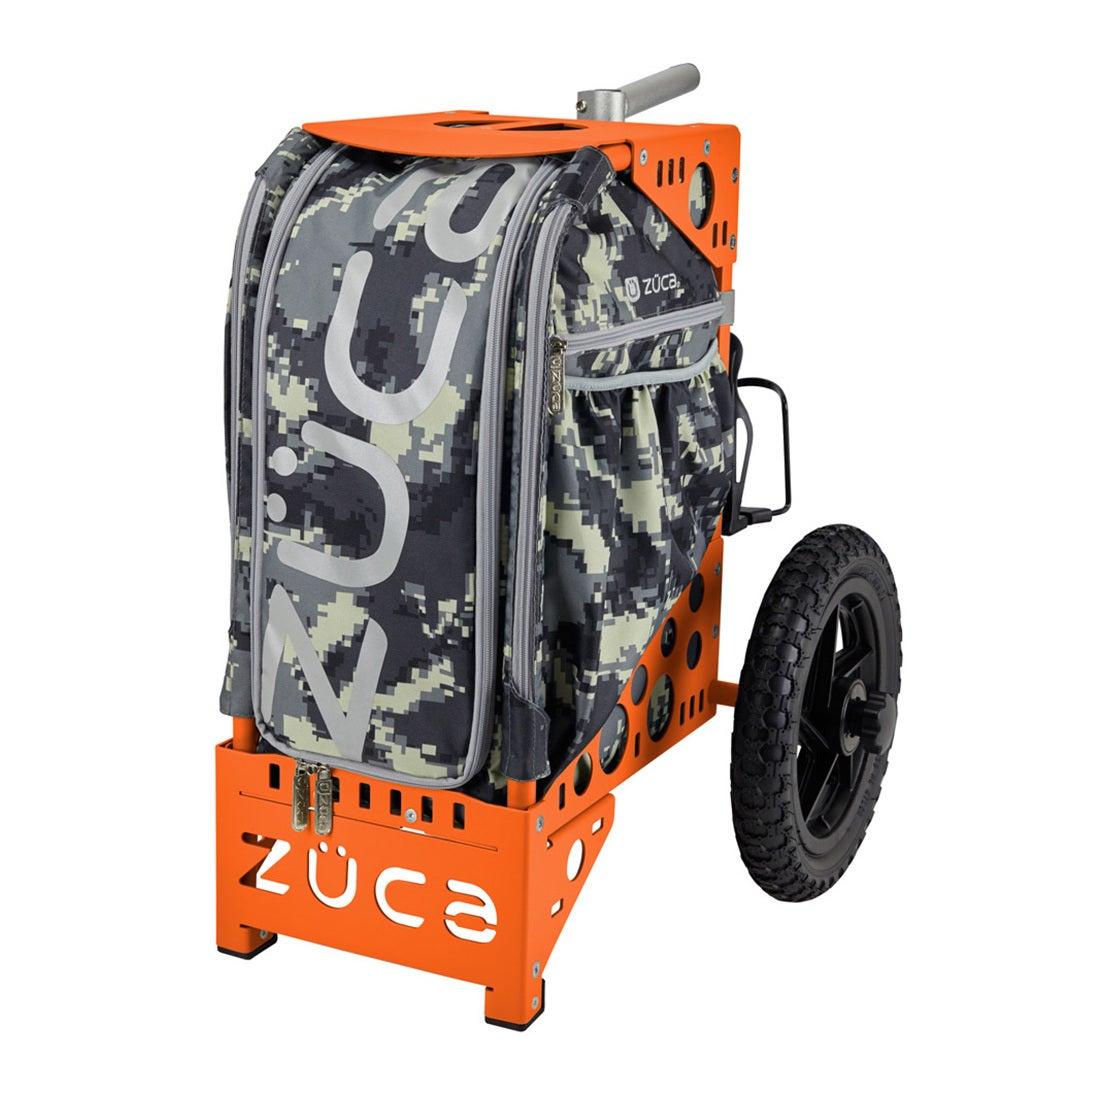 【SAC'S BAR】ズーカ ZUCA キャリーケース 1310 ALL-TERRAIN Anaconda/Orange メンズ